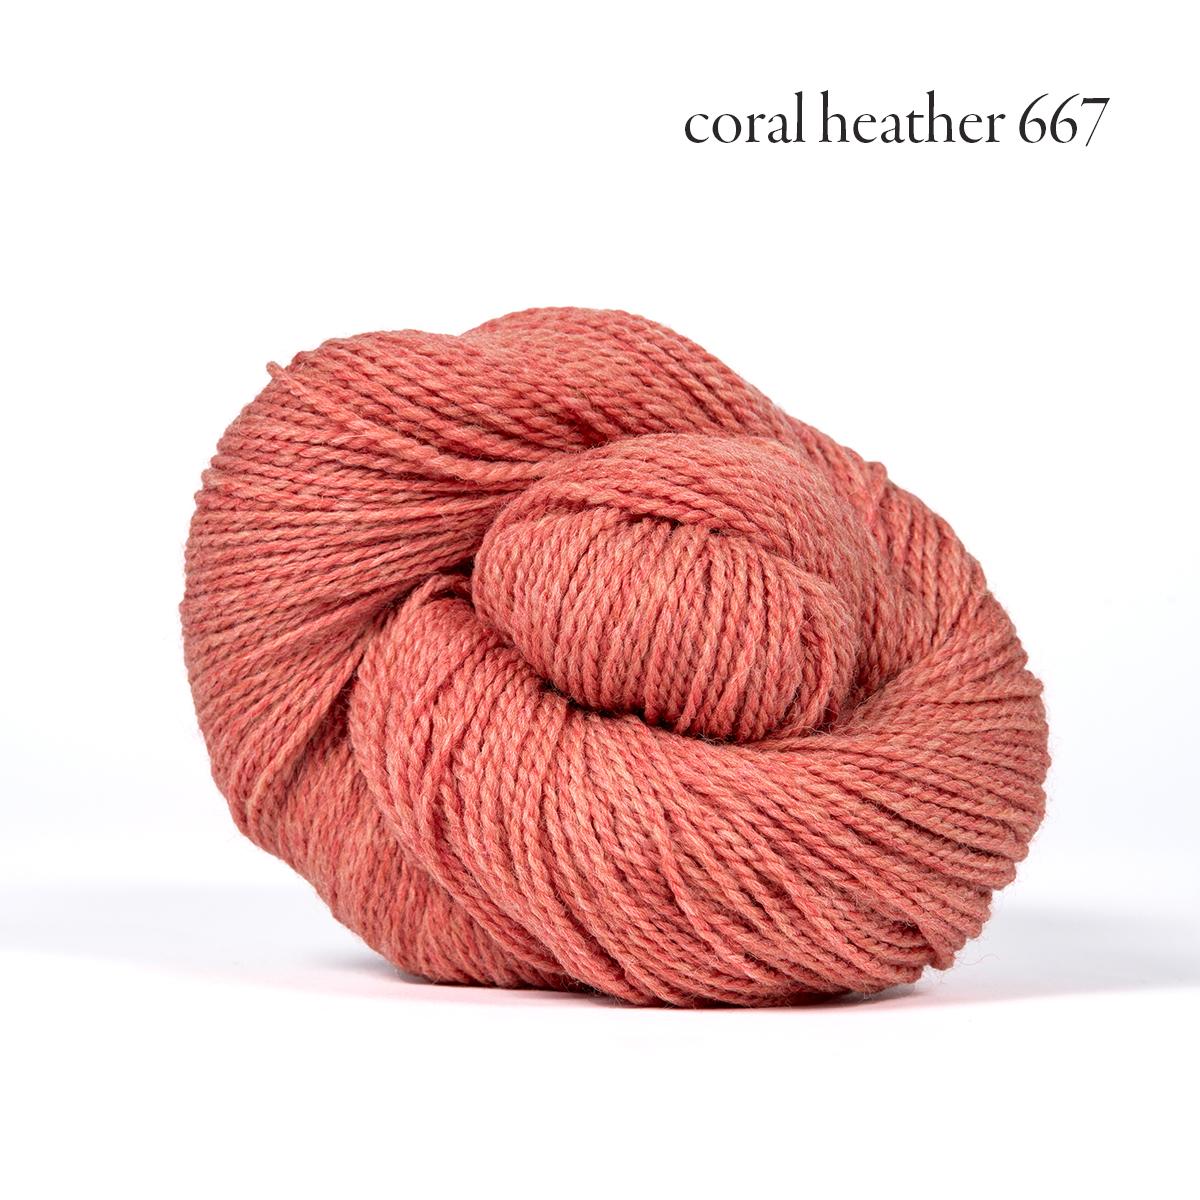 coral heather 667.jpg